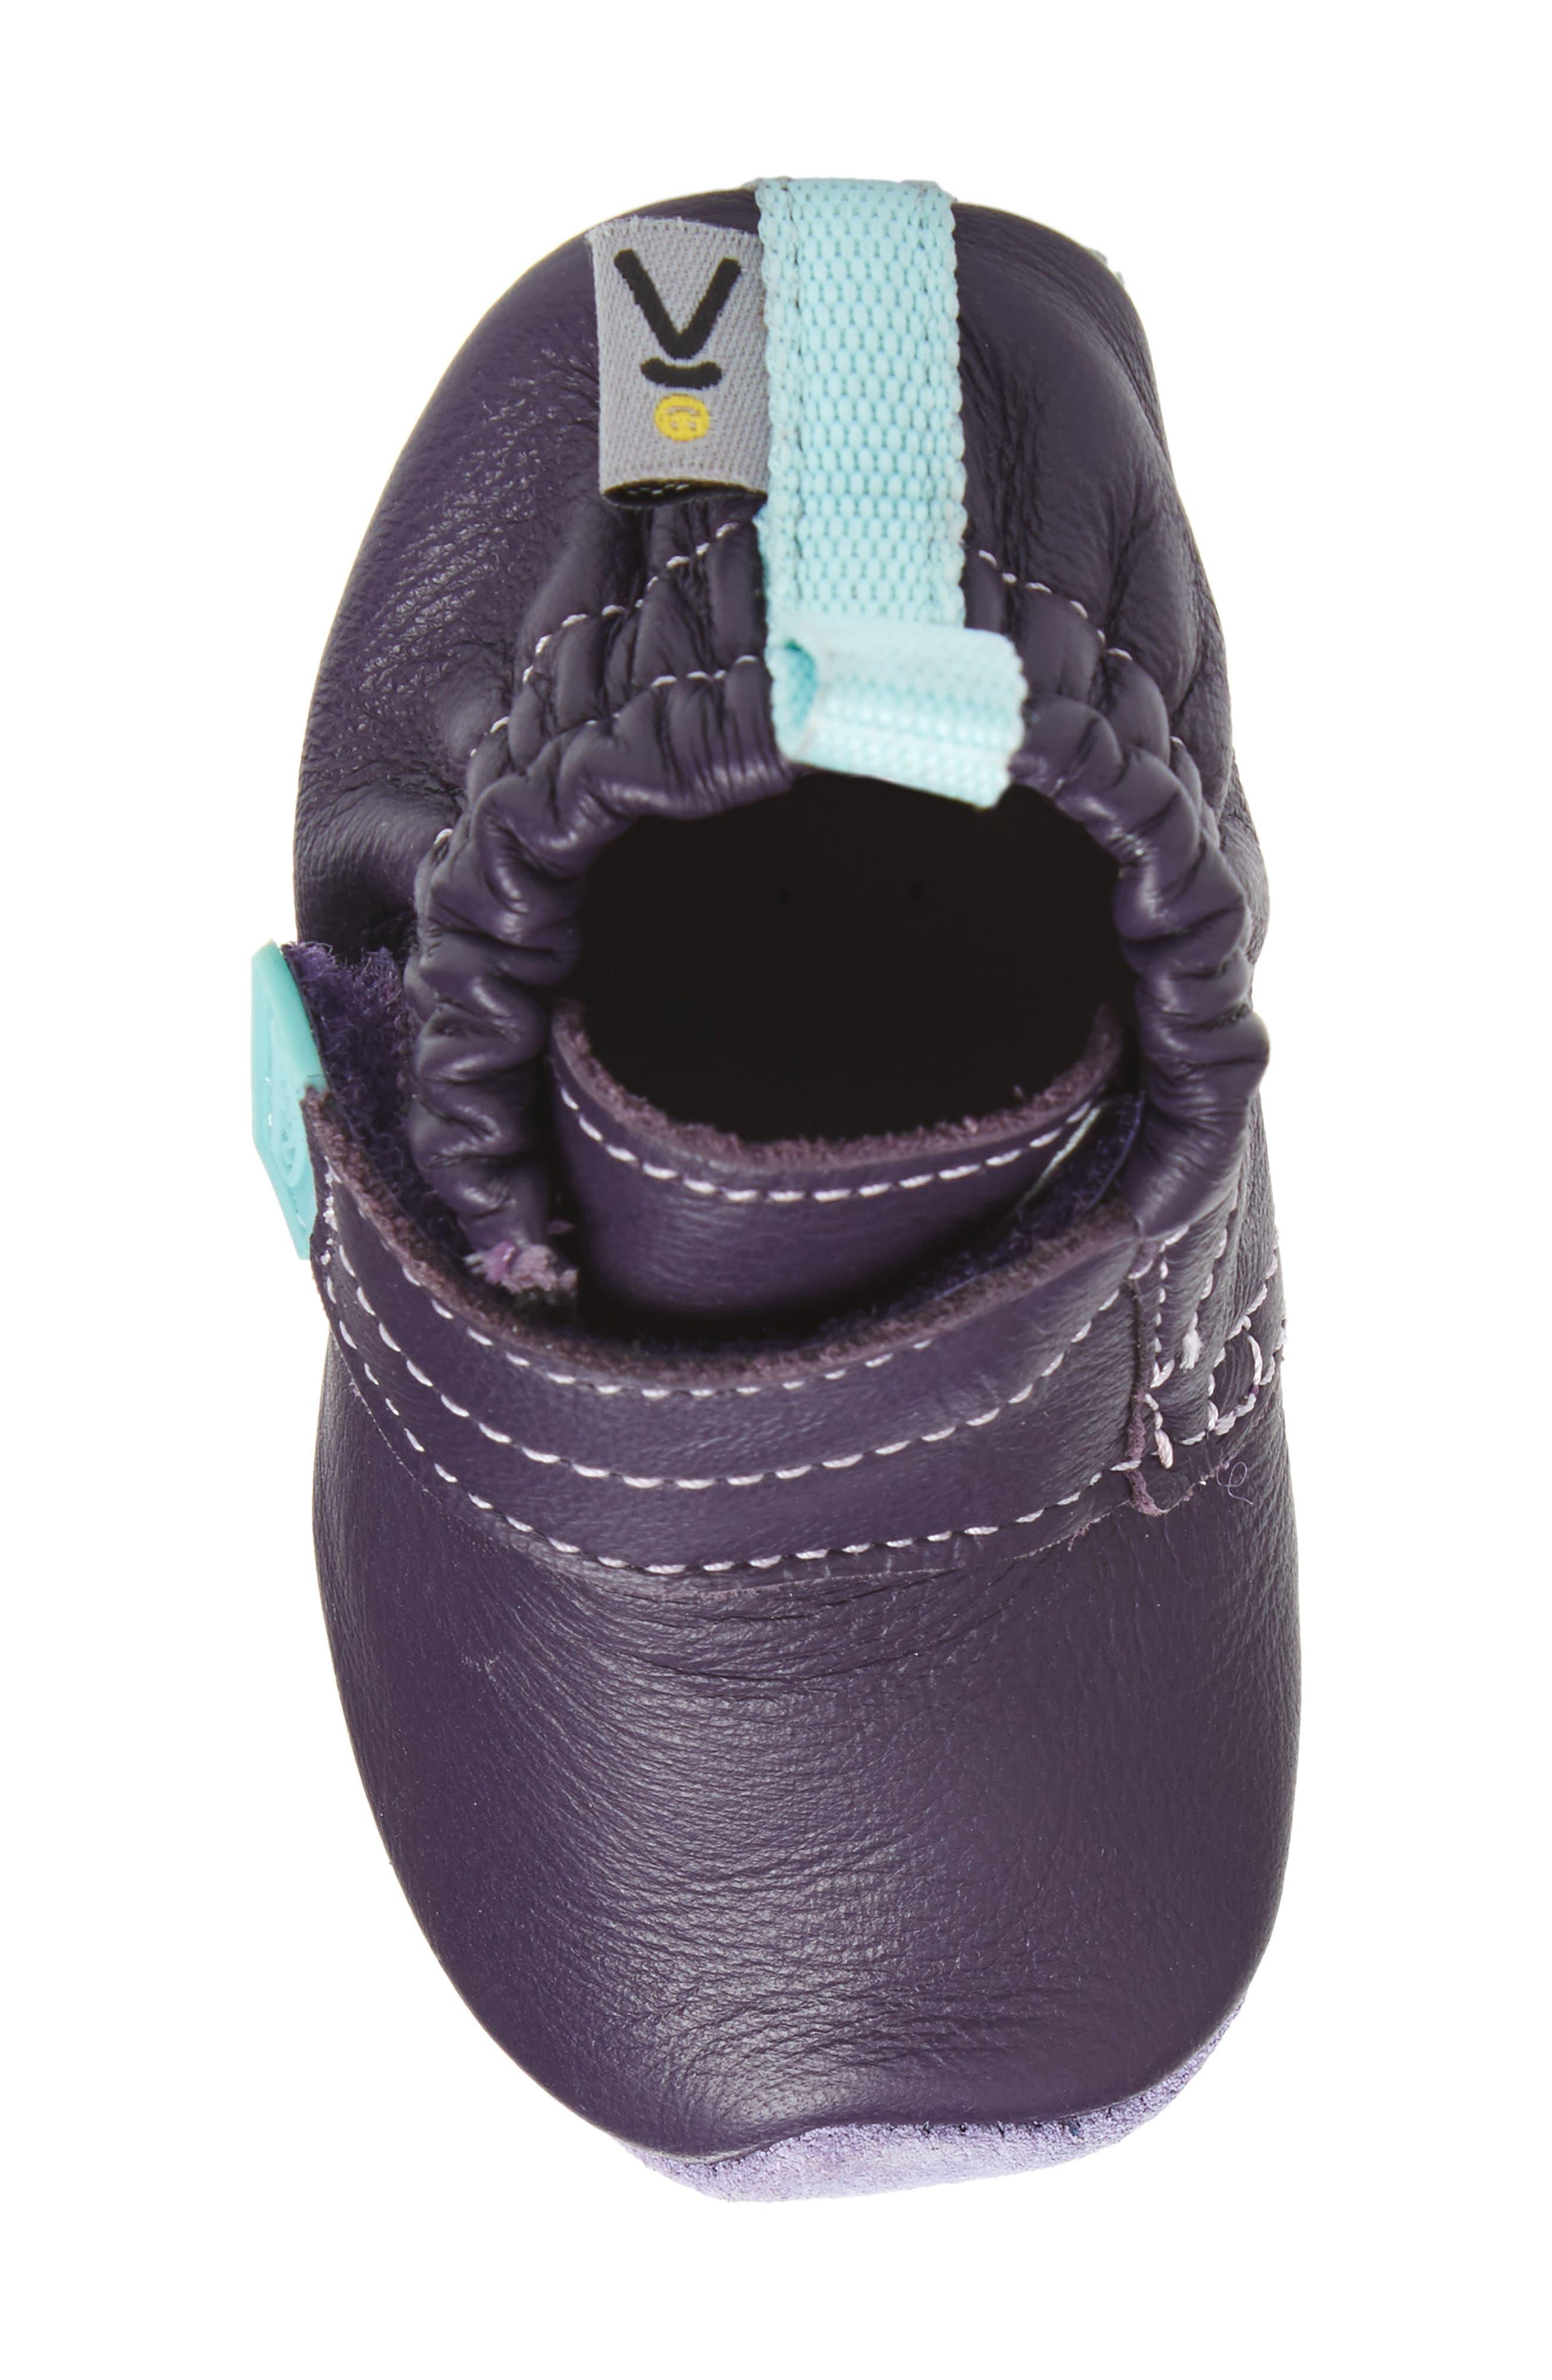 Leo Crib Shoe,                             Alternate thumbnail 5, color,                             PURPLE / SWEET LAVENDER